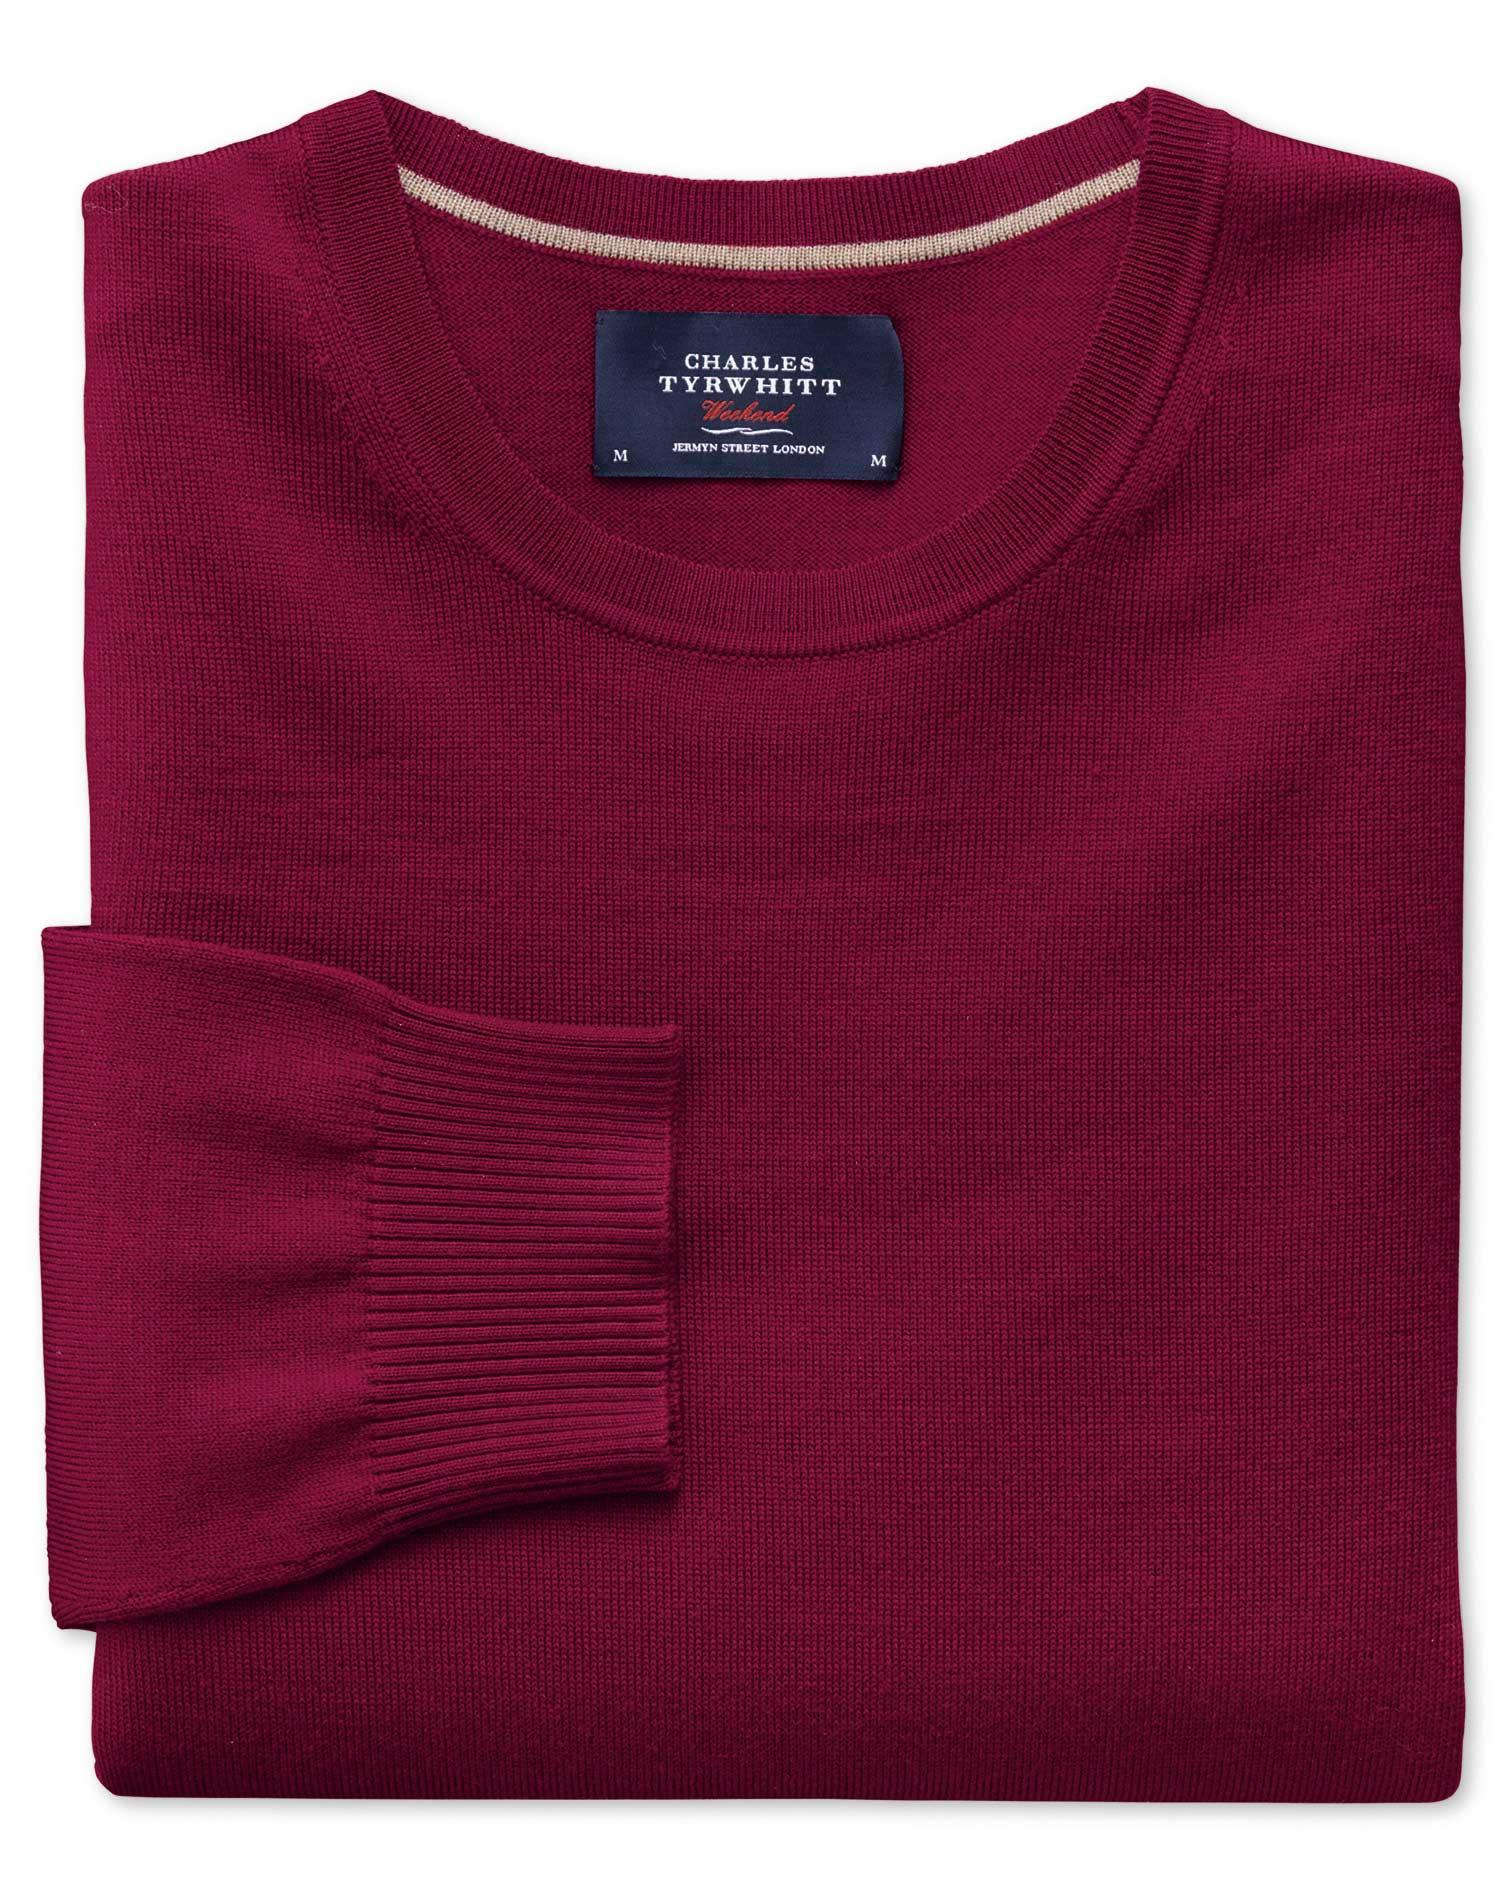 Dark Red Merino Wool Crew Neck Jumper Size XXL by Charles Tyrwhitt